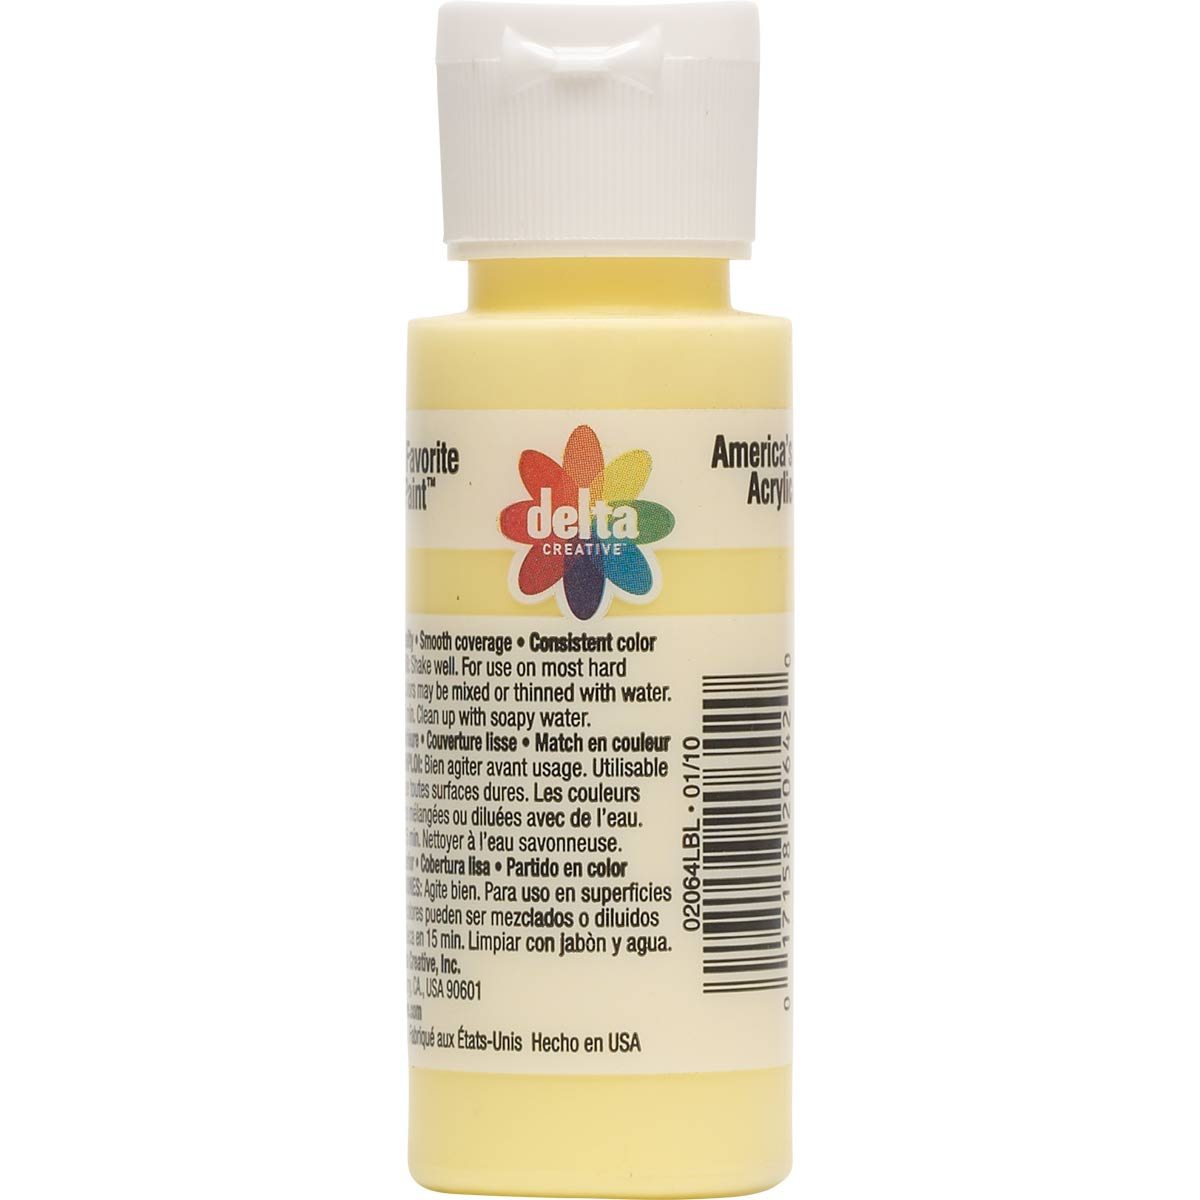 Delta Ceramcoat ® Acrylic Paint - Sunbright Yellow, 2 oz. - 020640202W